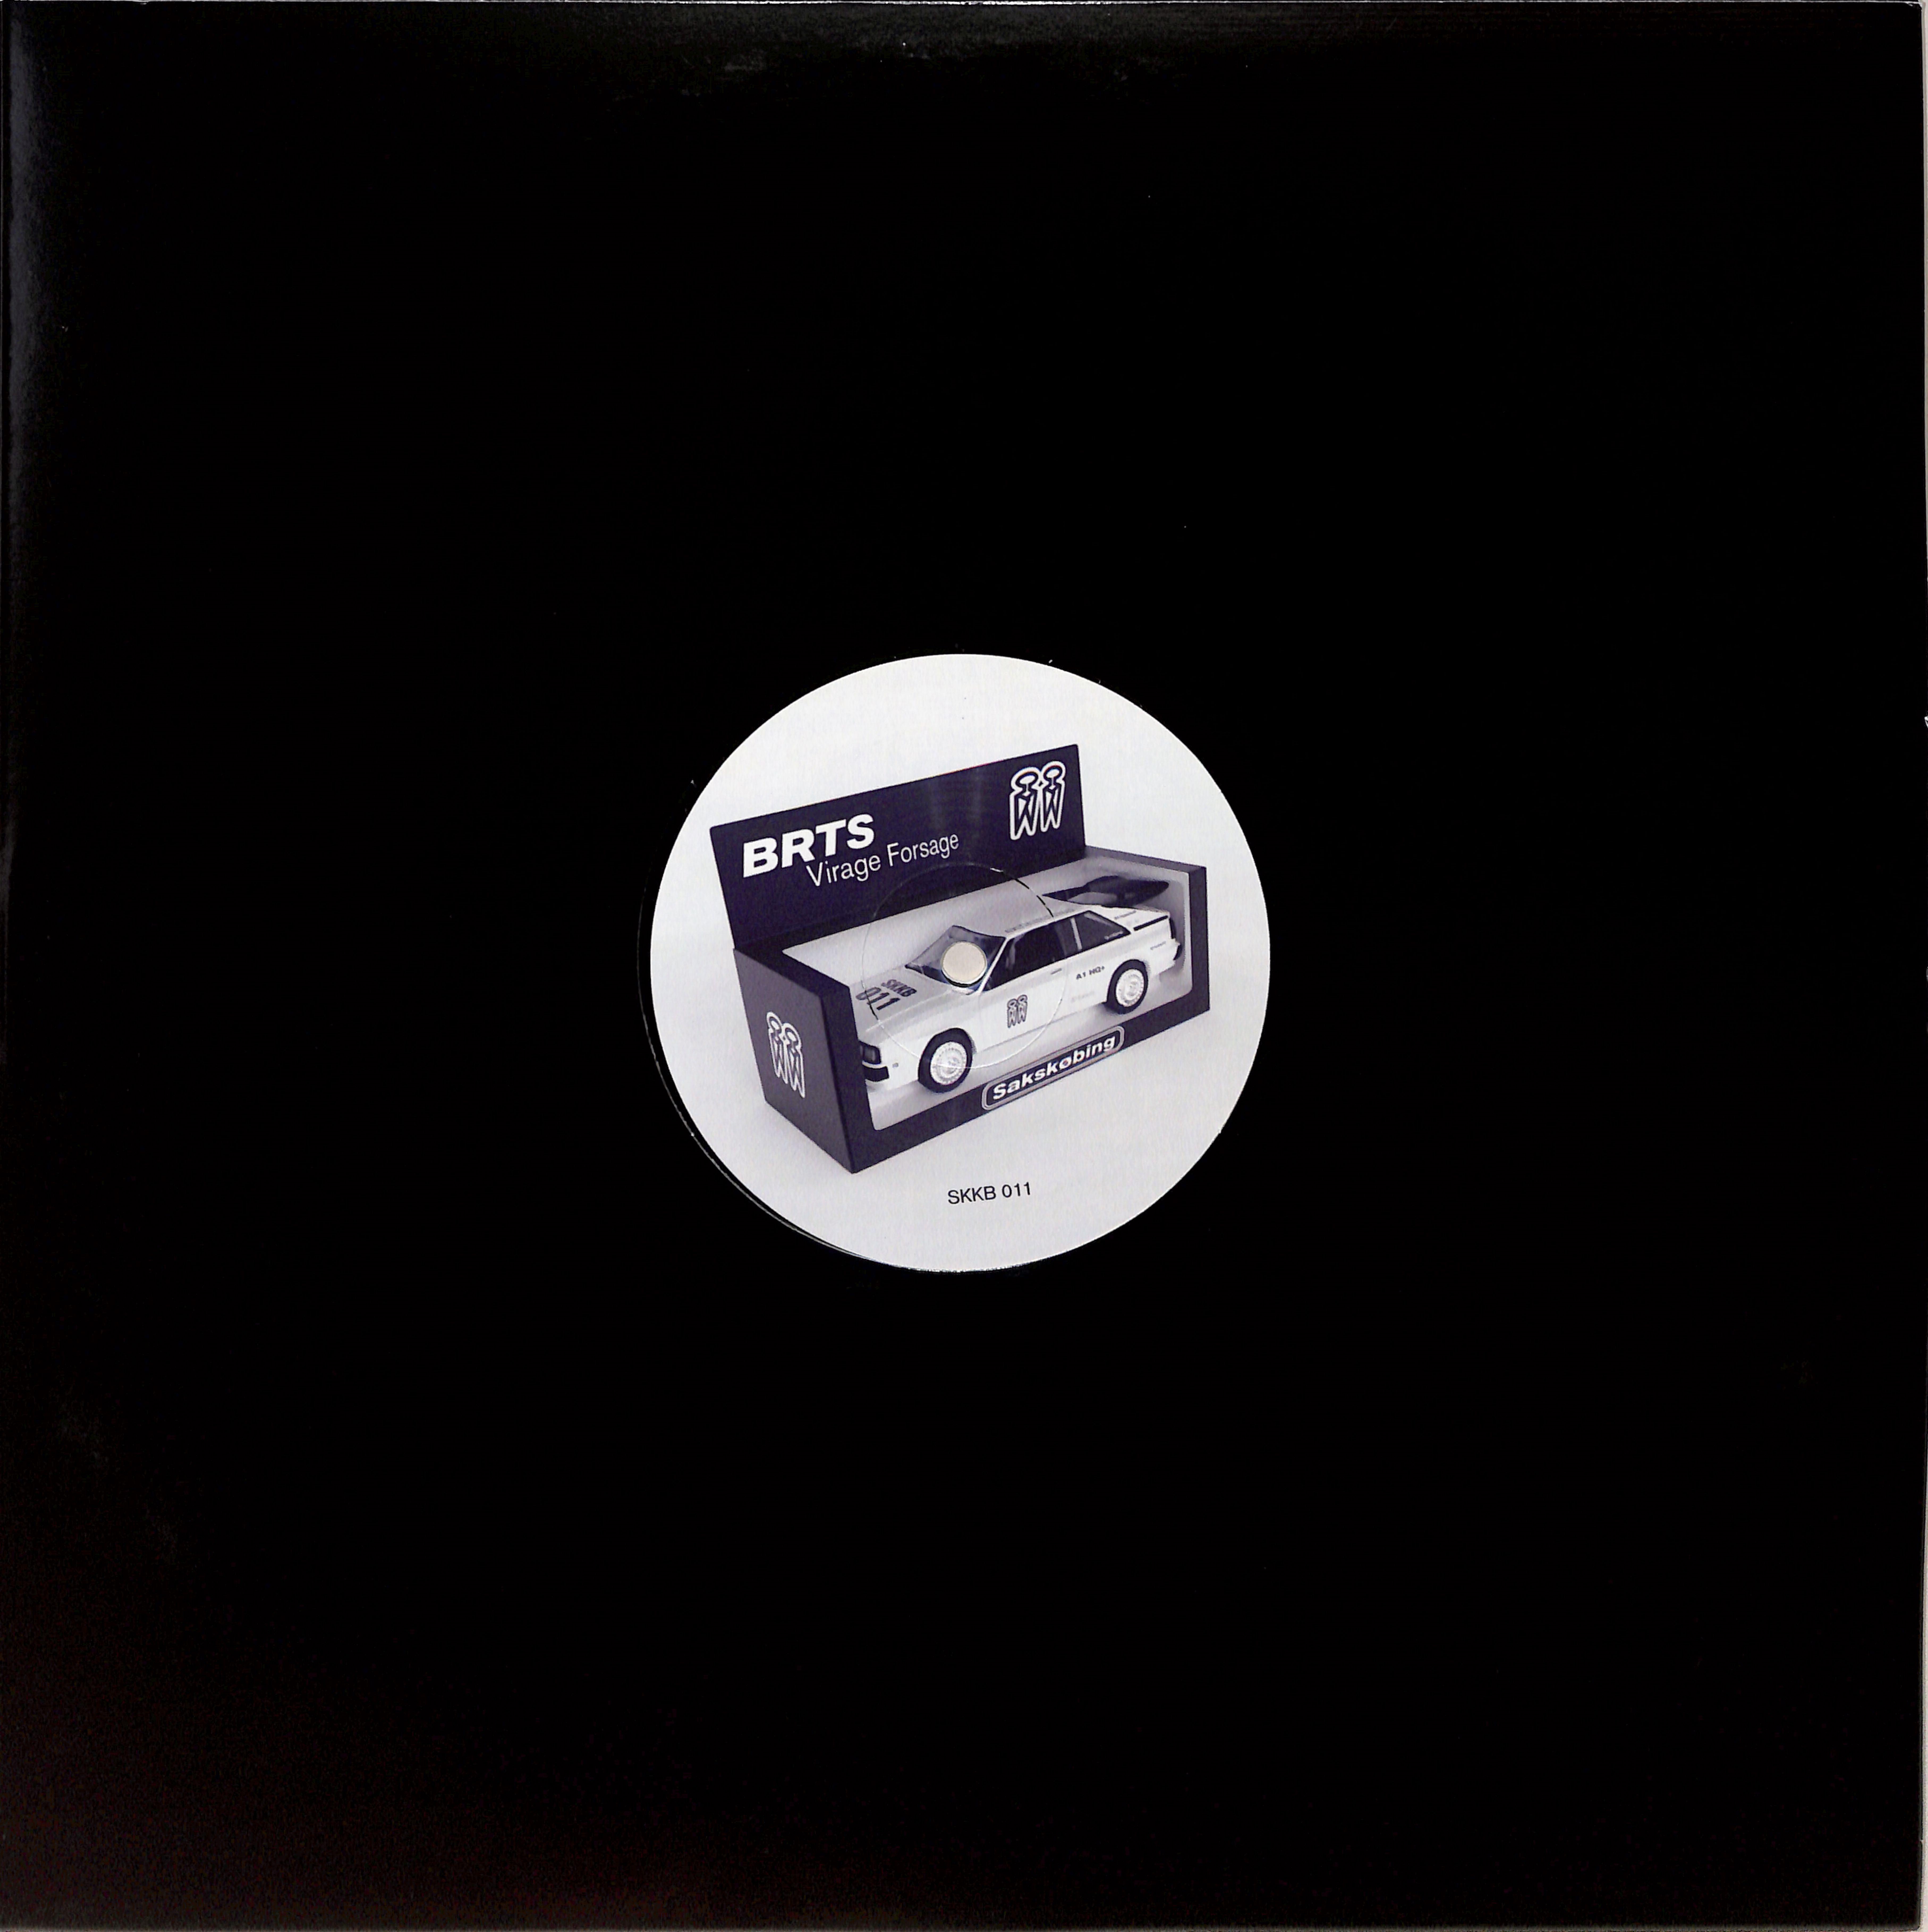 BRTS - VIRAGE FORSAGE EP